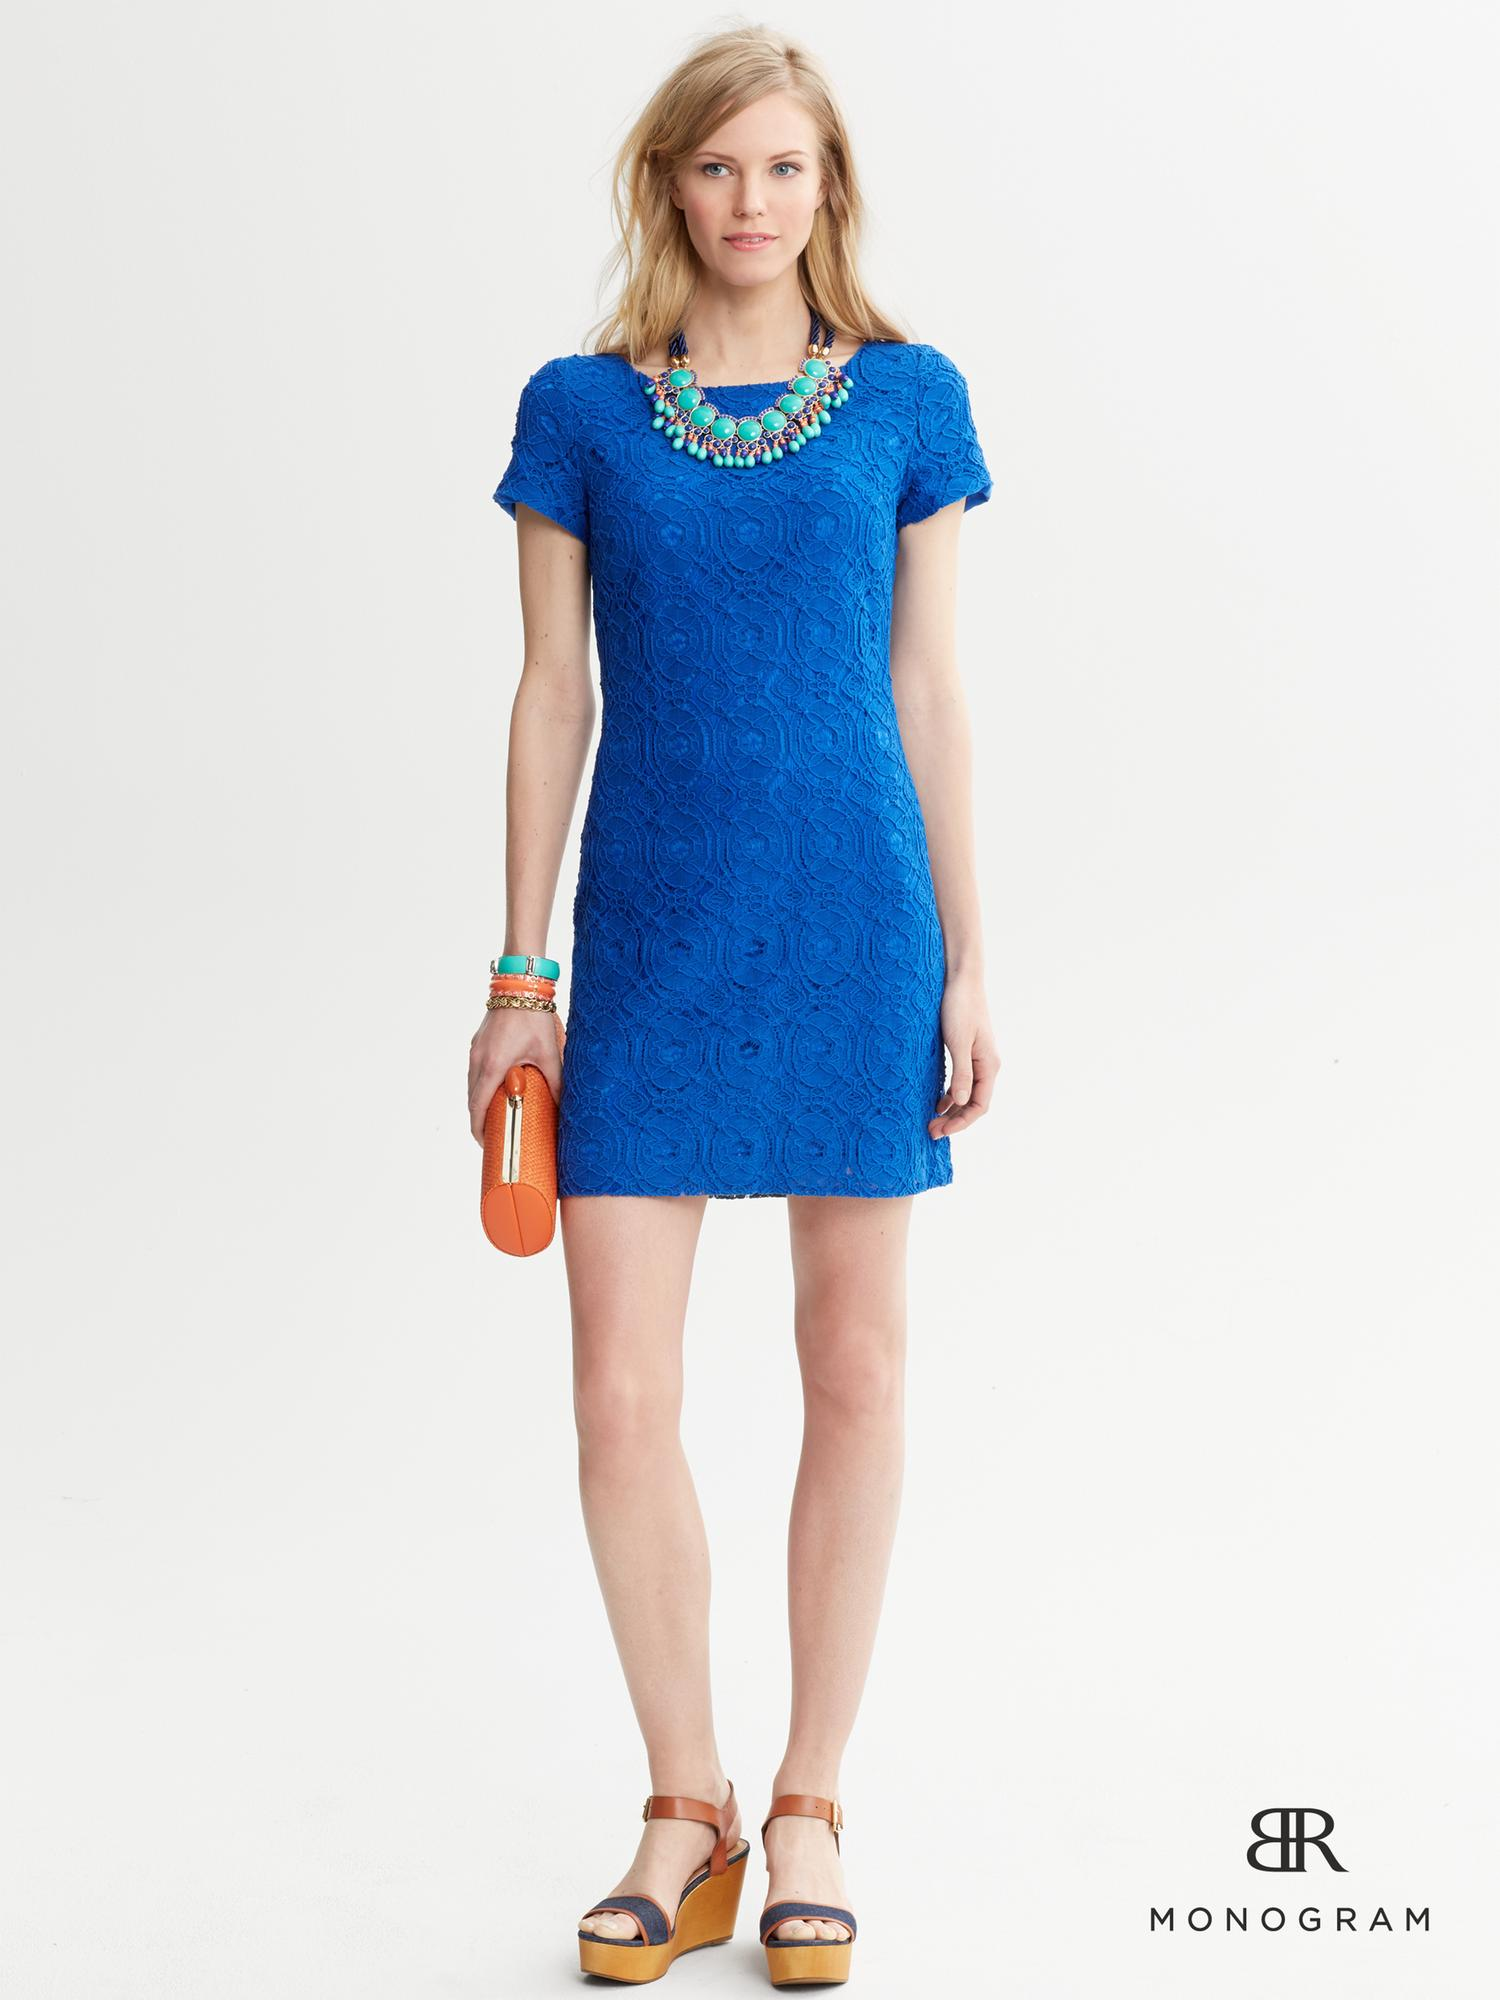 Banana Republic Monogram Lace Short Sleeve Dress In Blue